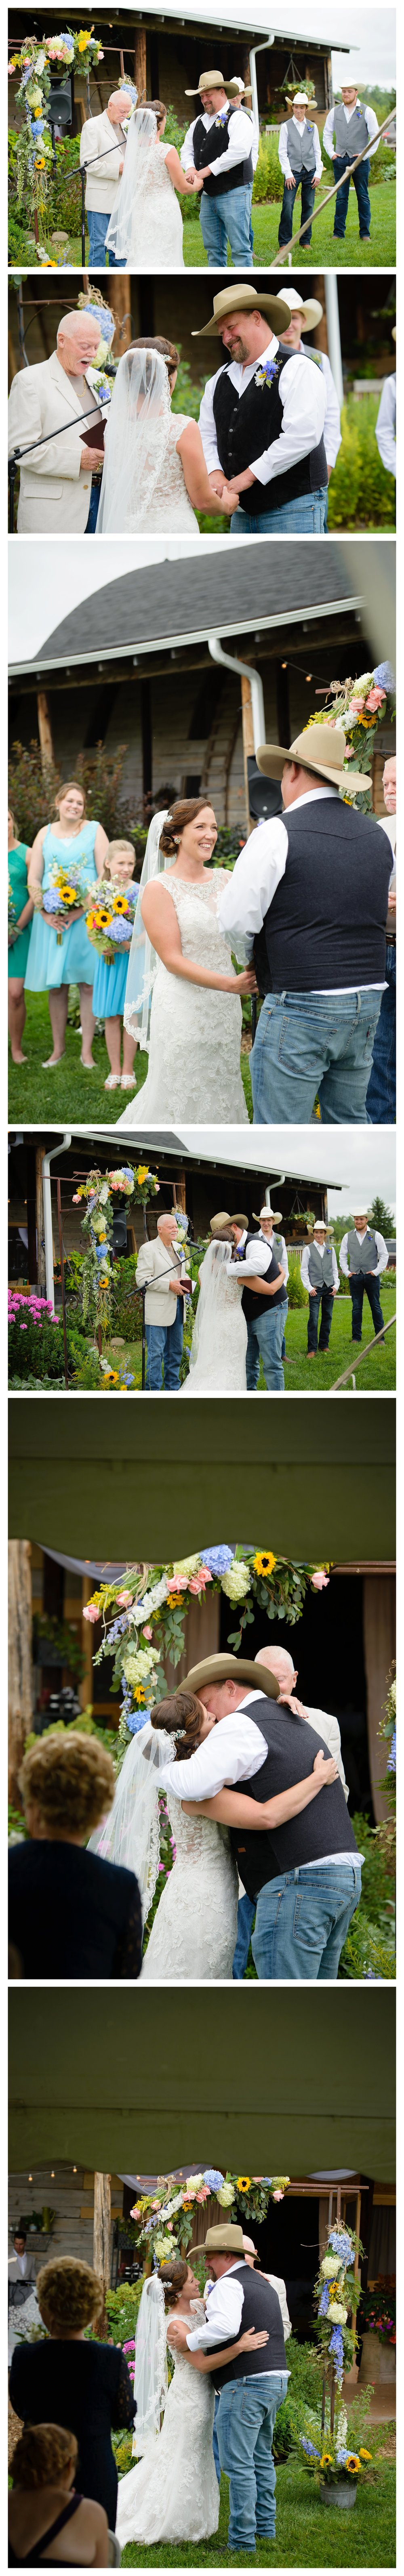 ps 139 photography jen jensen ashland freehands farm wedding northwoods_0033.jpg